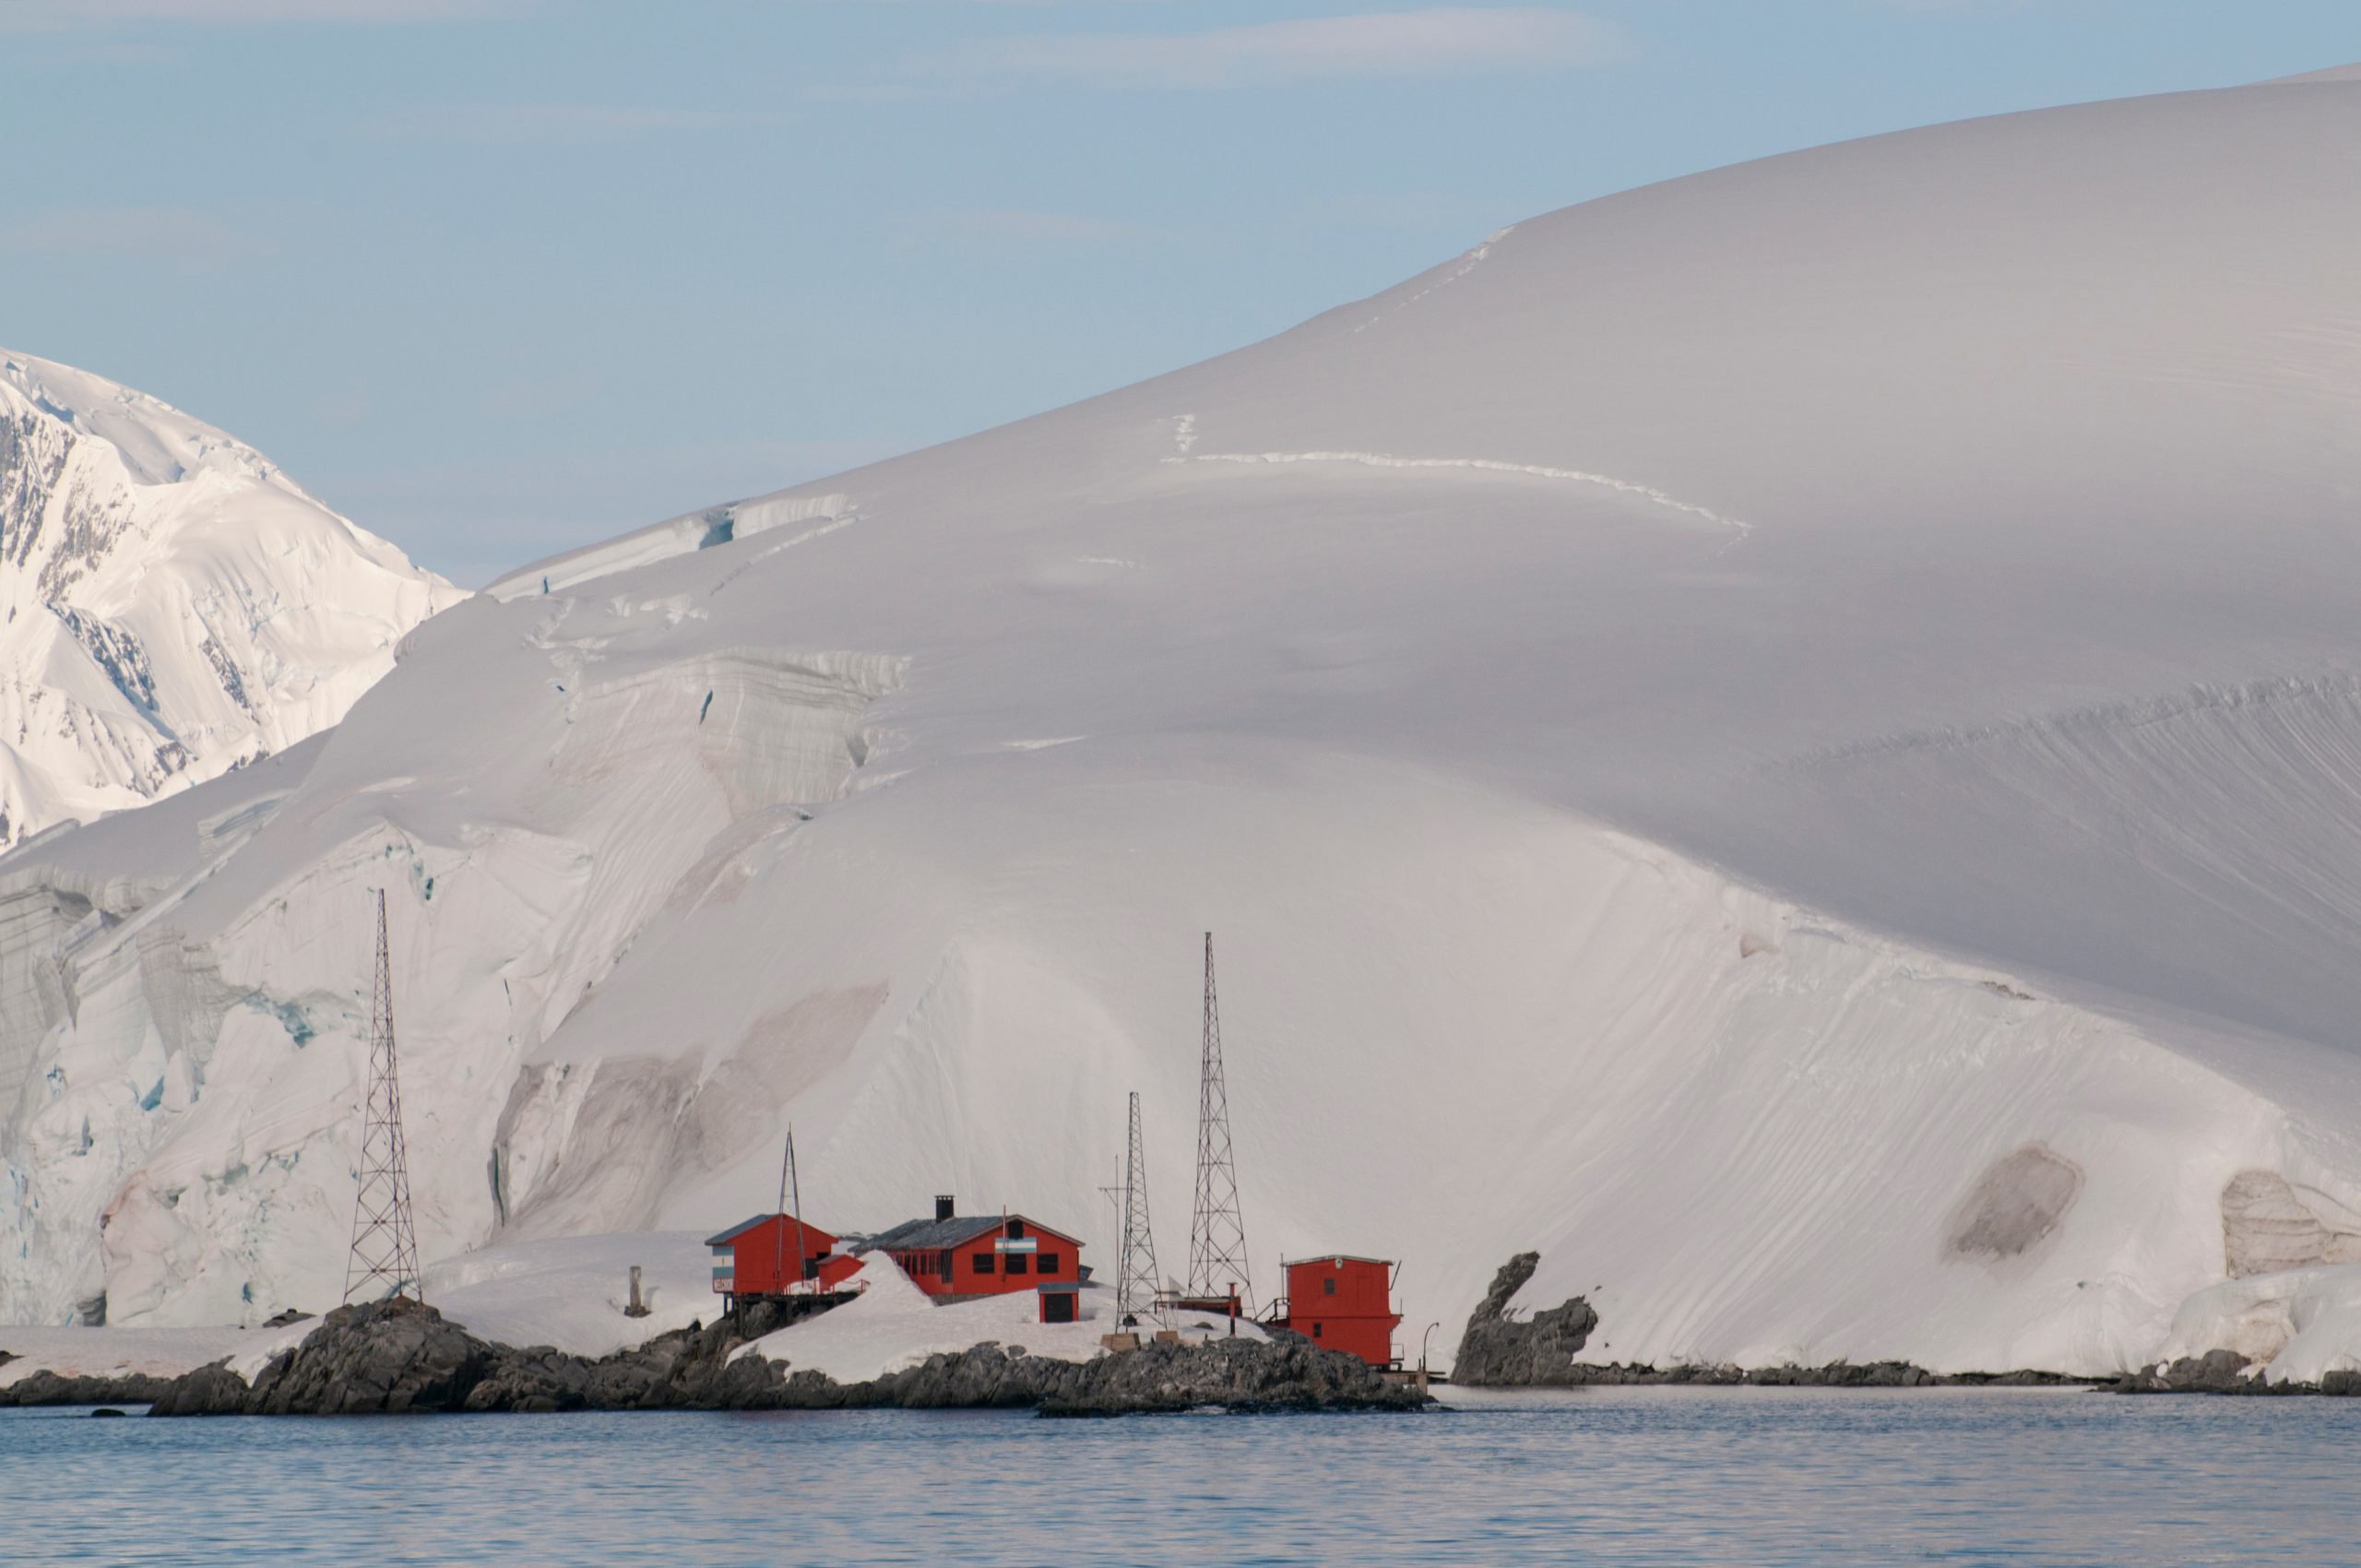 Antarctica Station